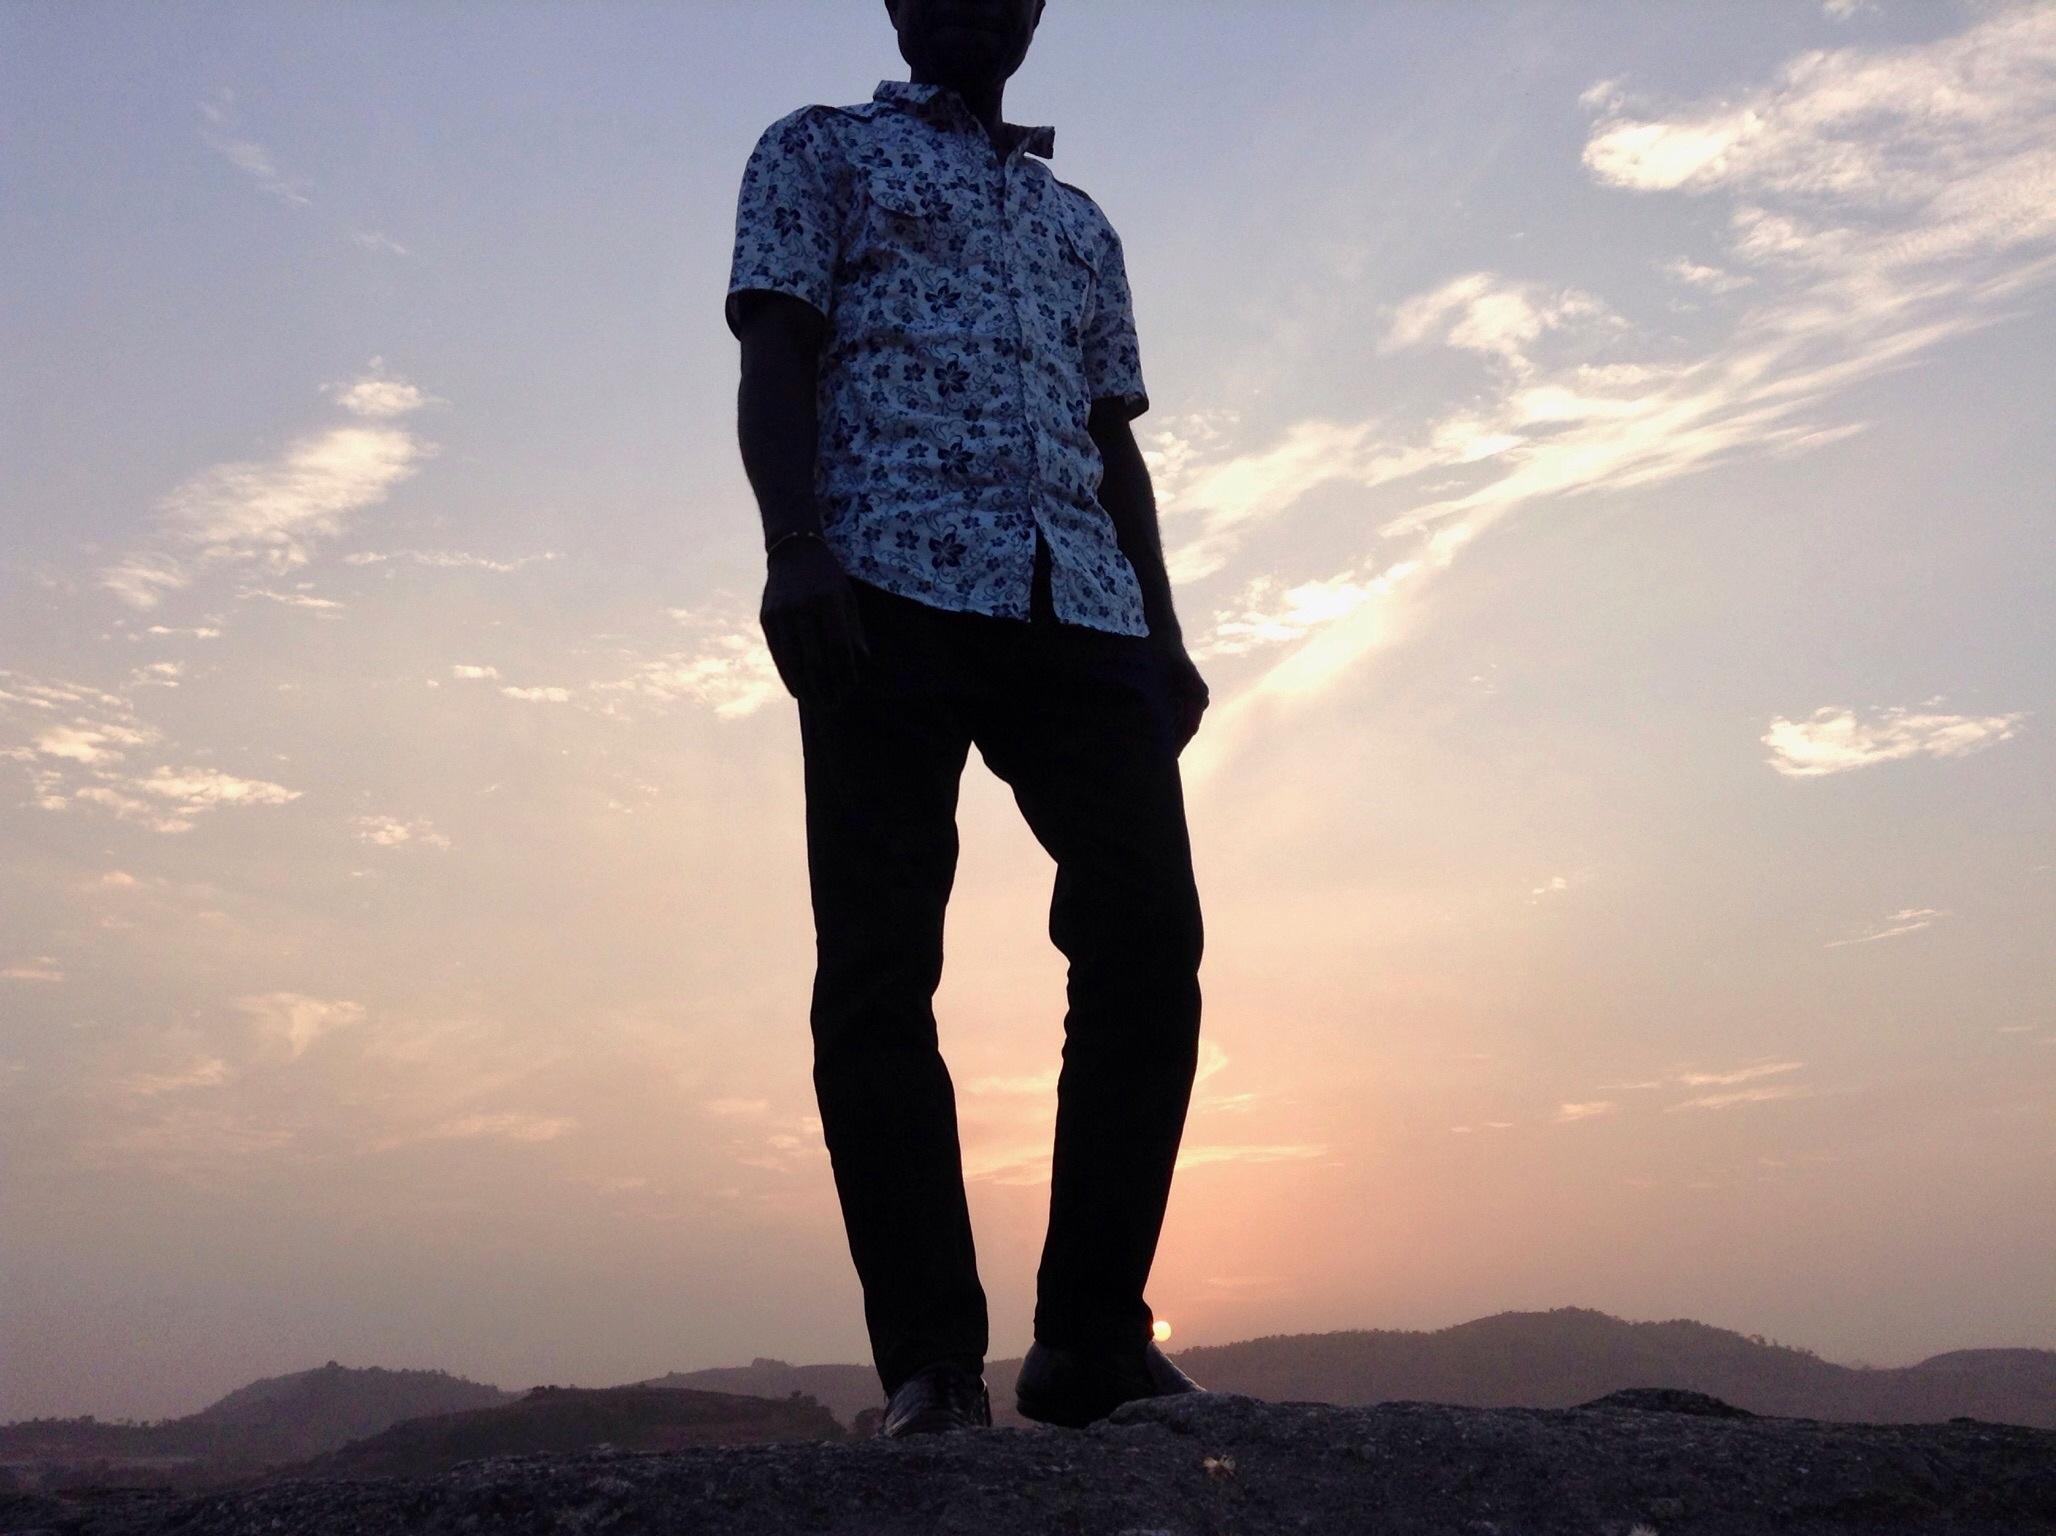 Sunset in Ushafa Village, FCT, Abuja, Nigeria. #JujuFilms